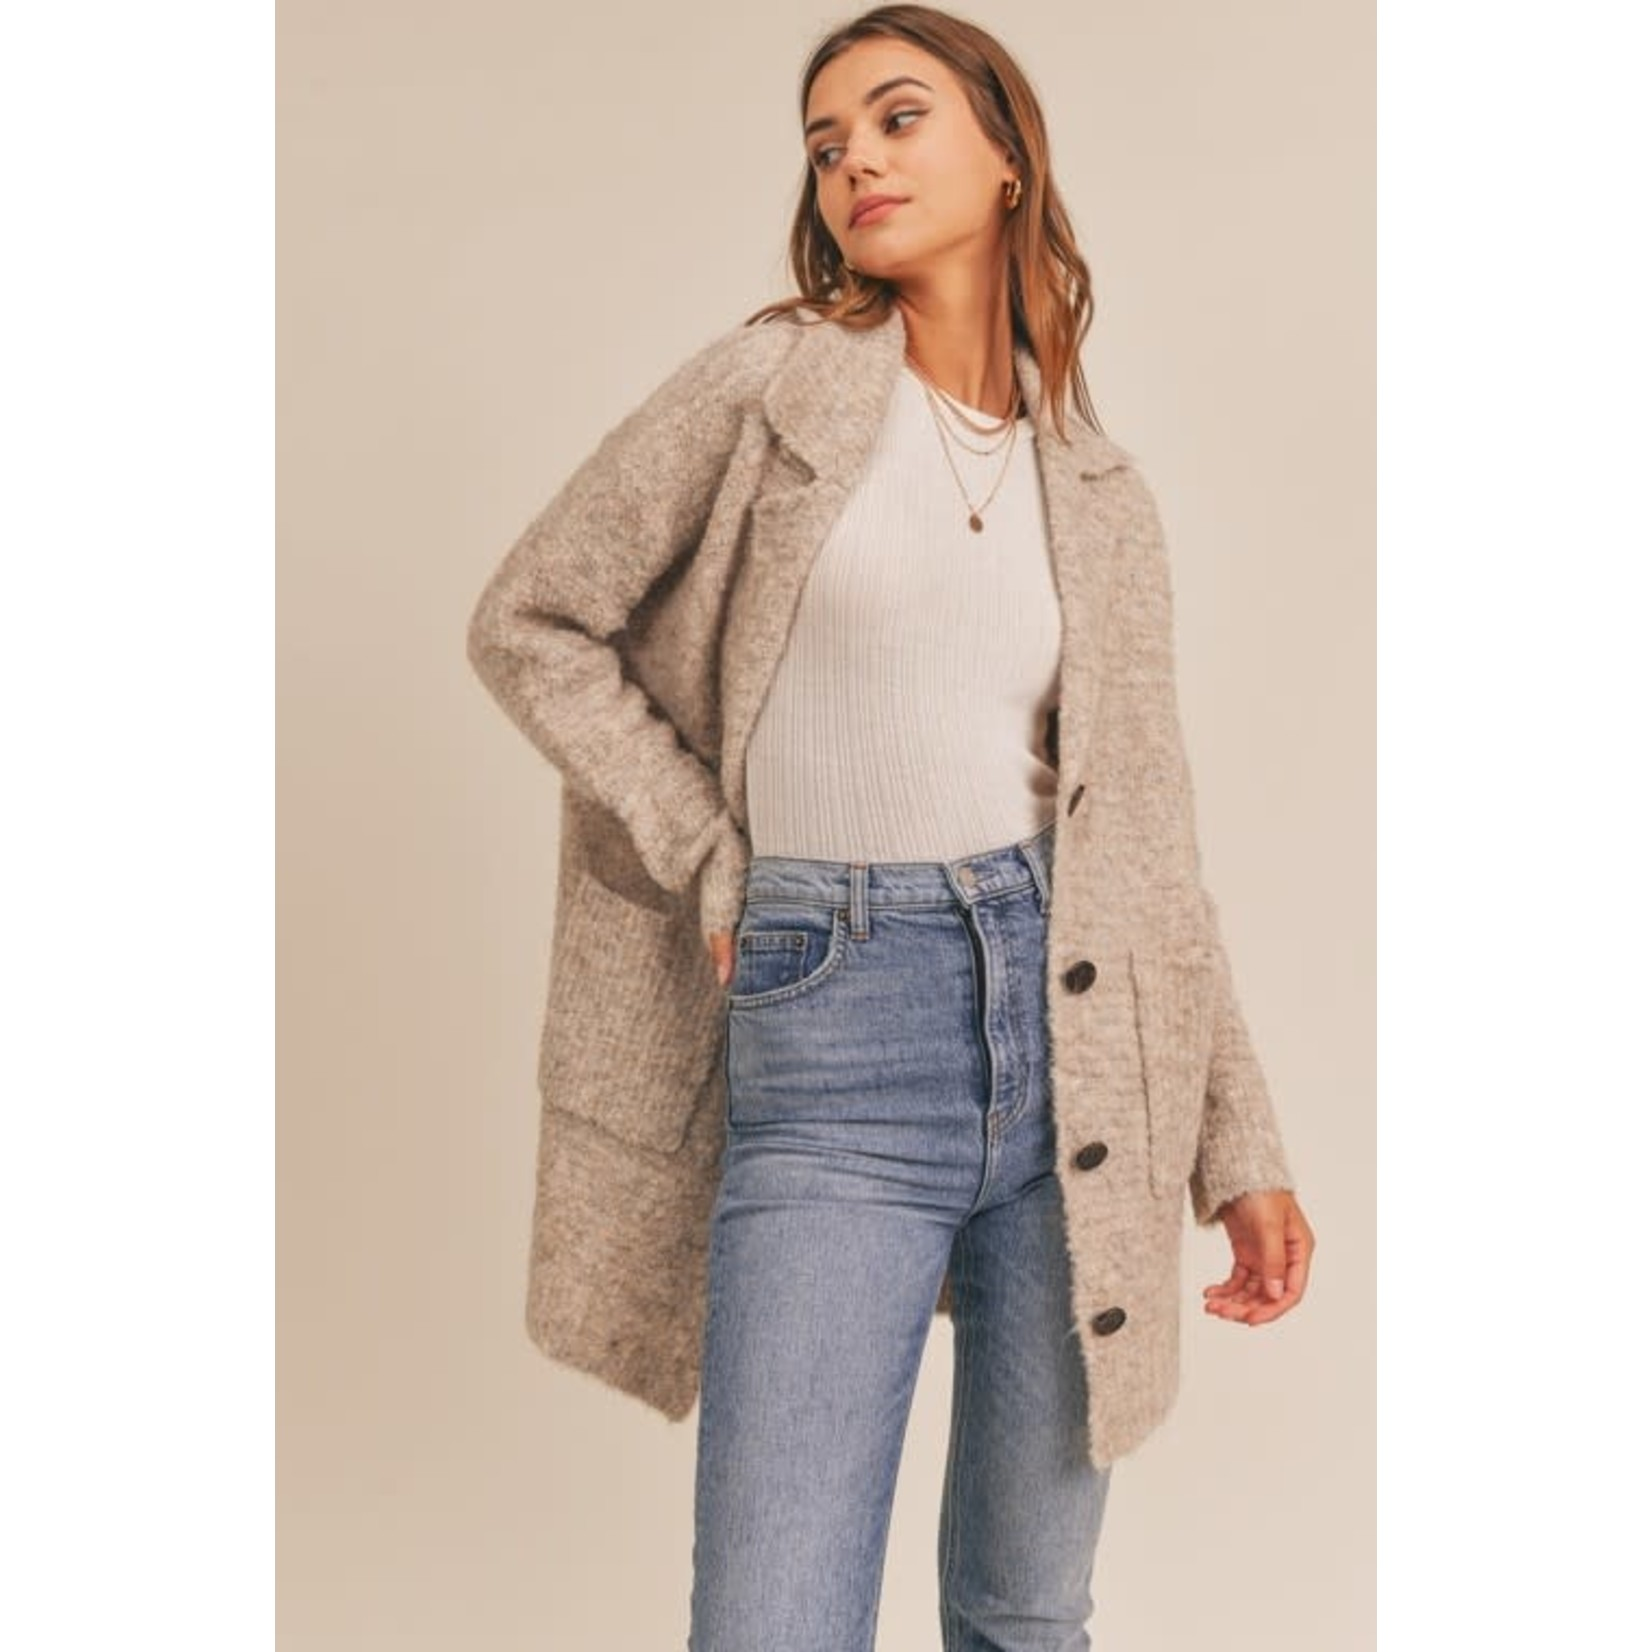 EM & ELLE Polland Button Down Sweater